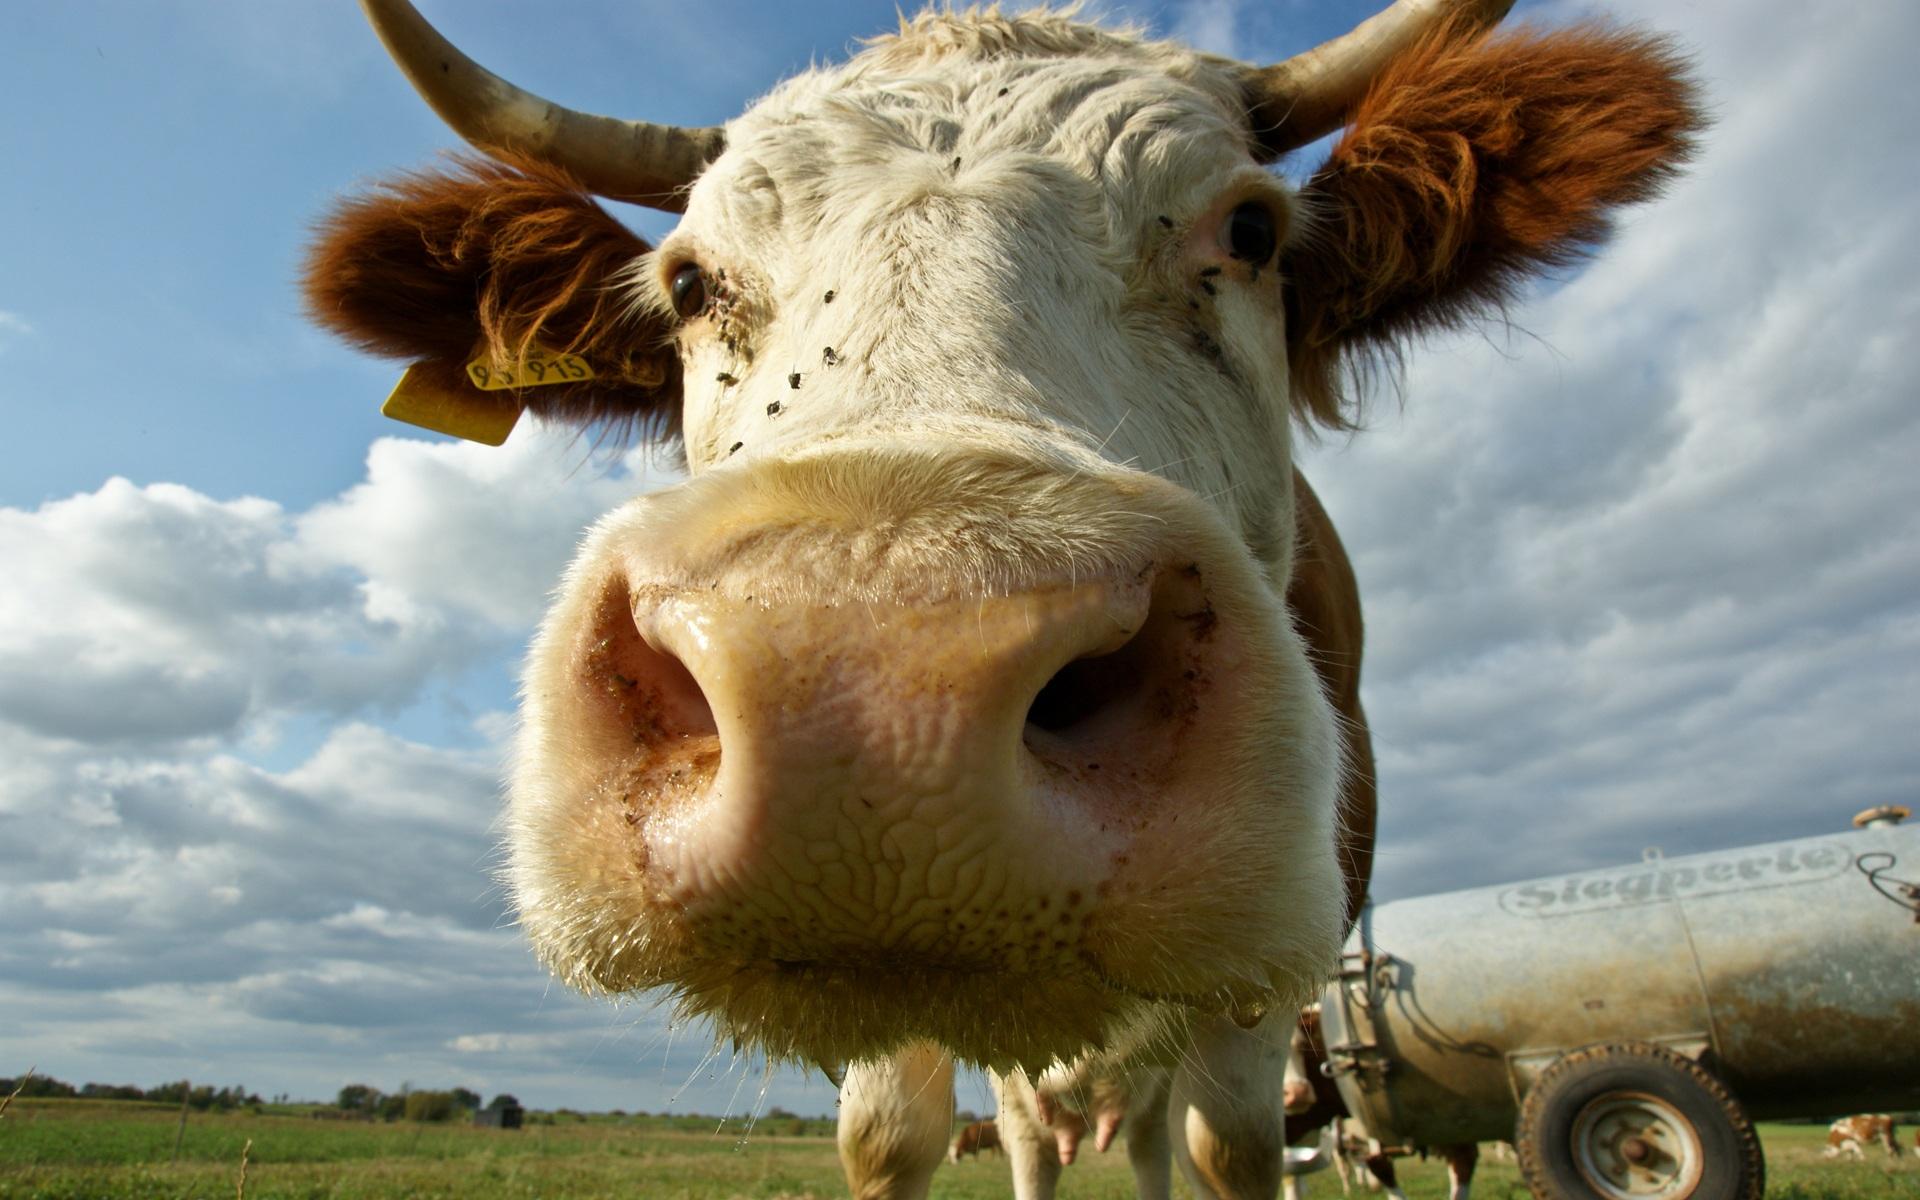 cow-face-j0sufok7.jpg